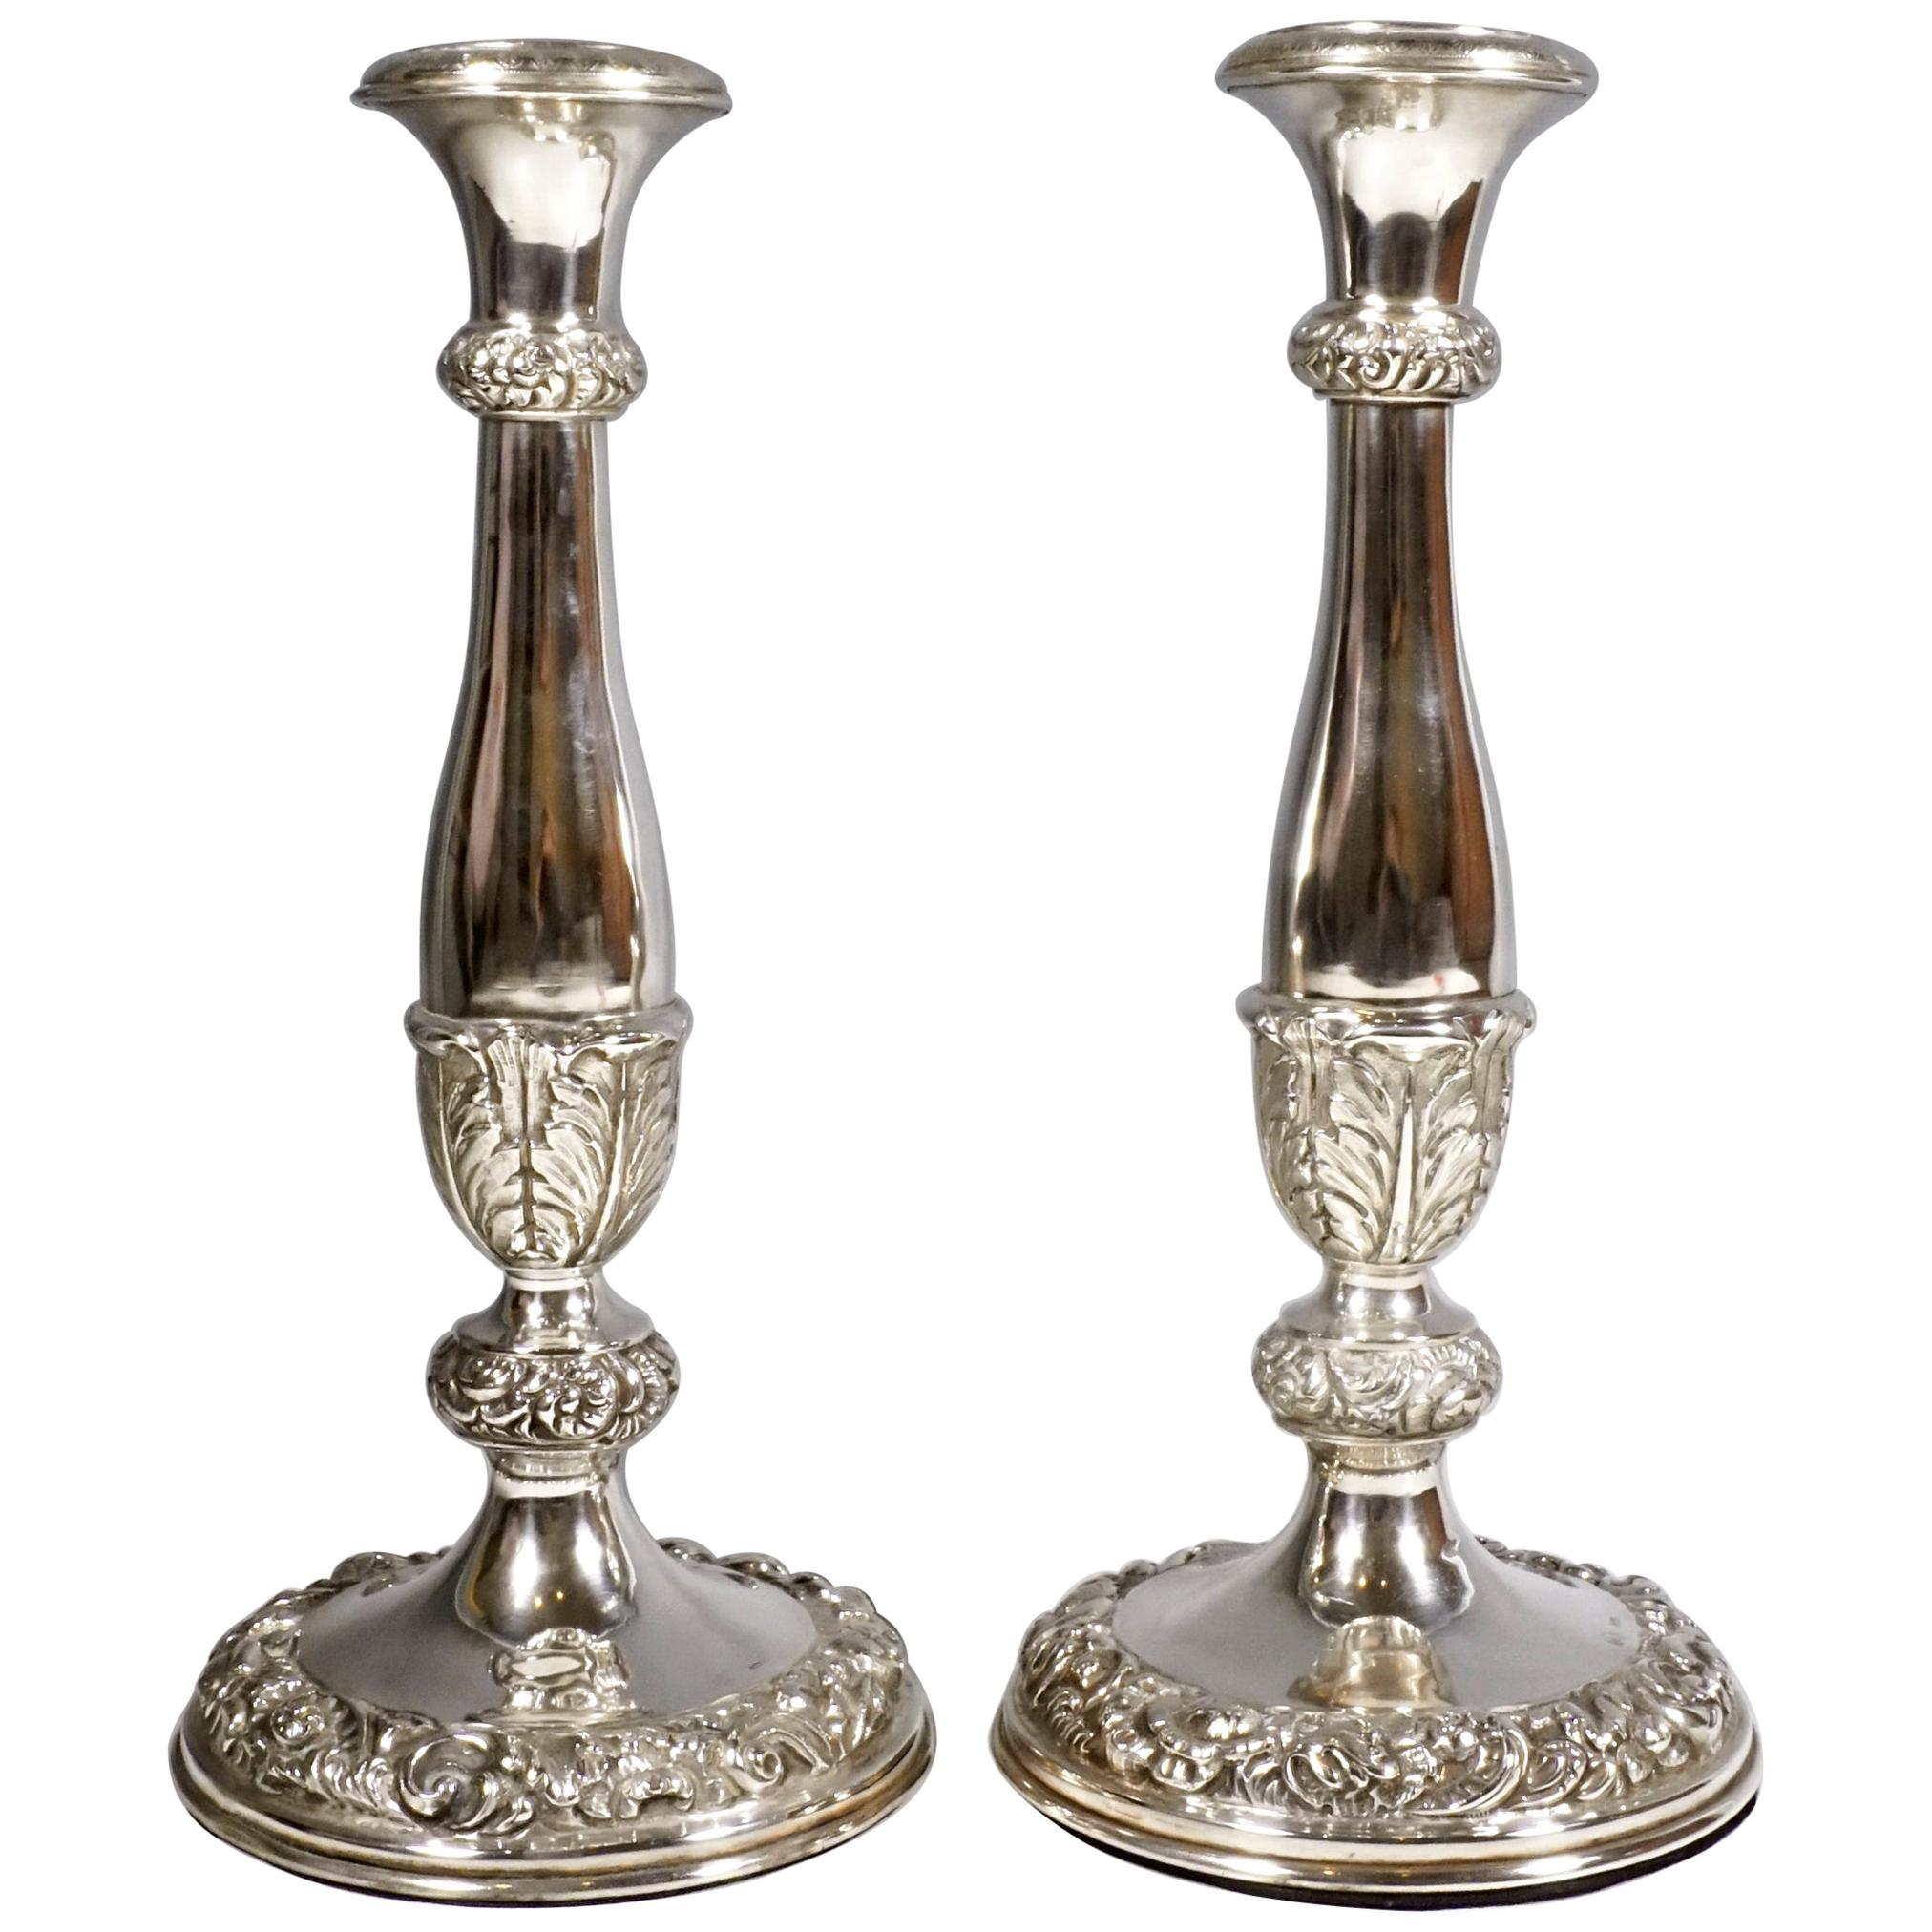 Pair of Antique Vienna Biedermeier Silver Candleholders, Dated 1840